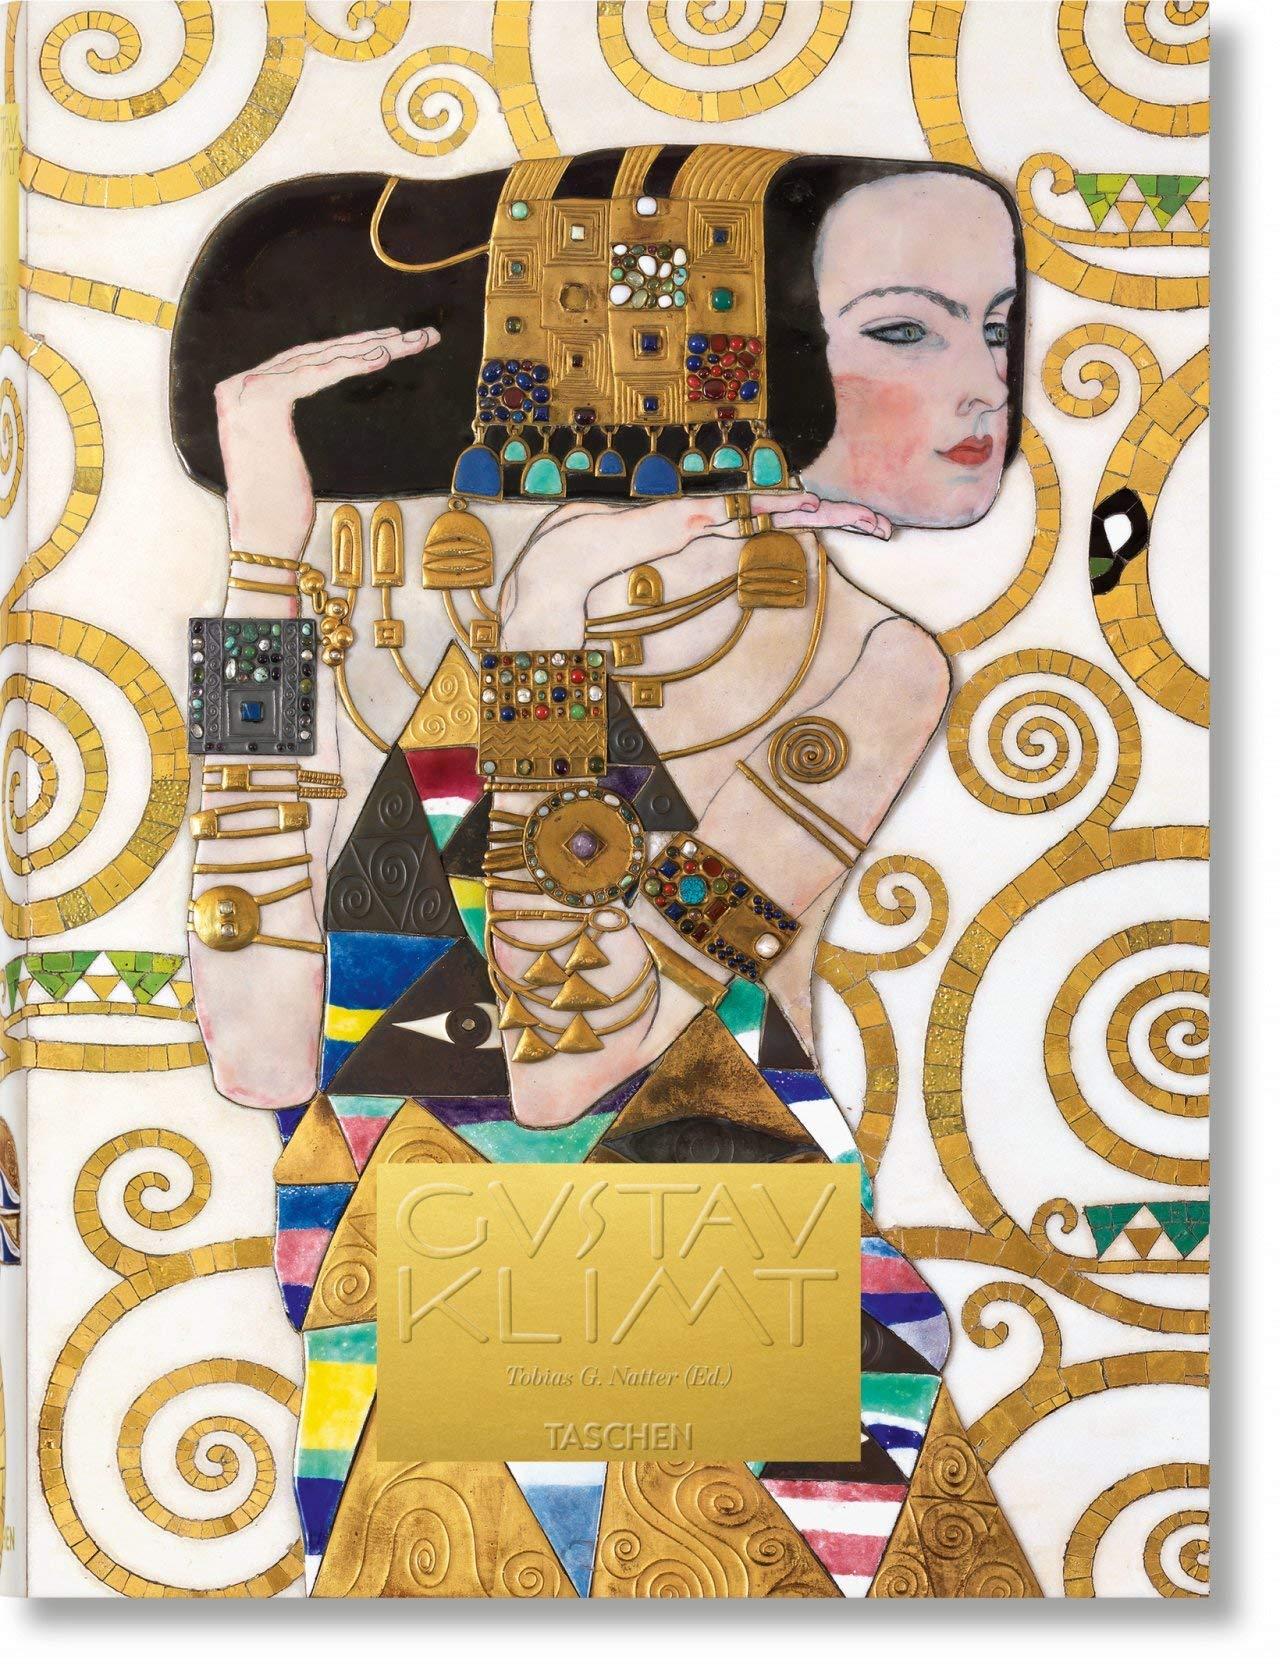 Gustav Klimt. Obras completas por Tobias G. Natter